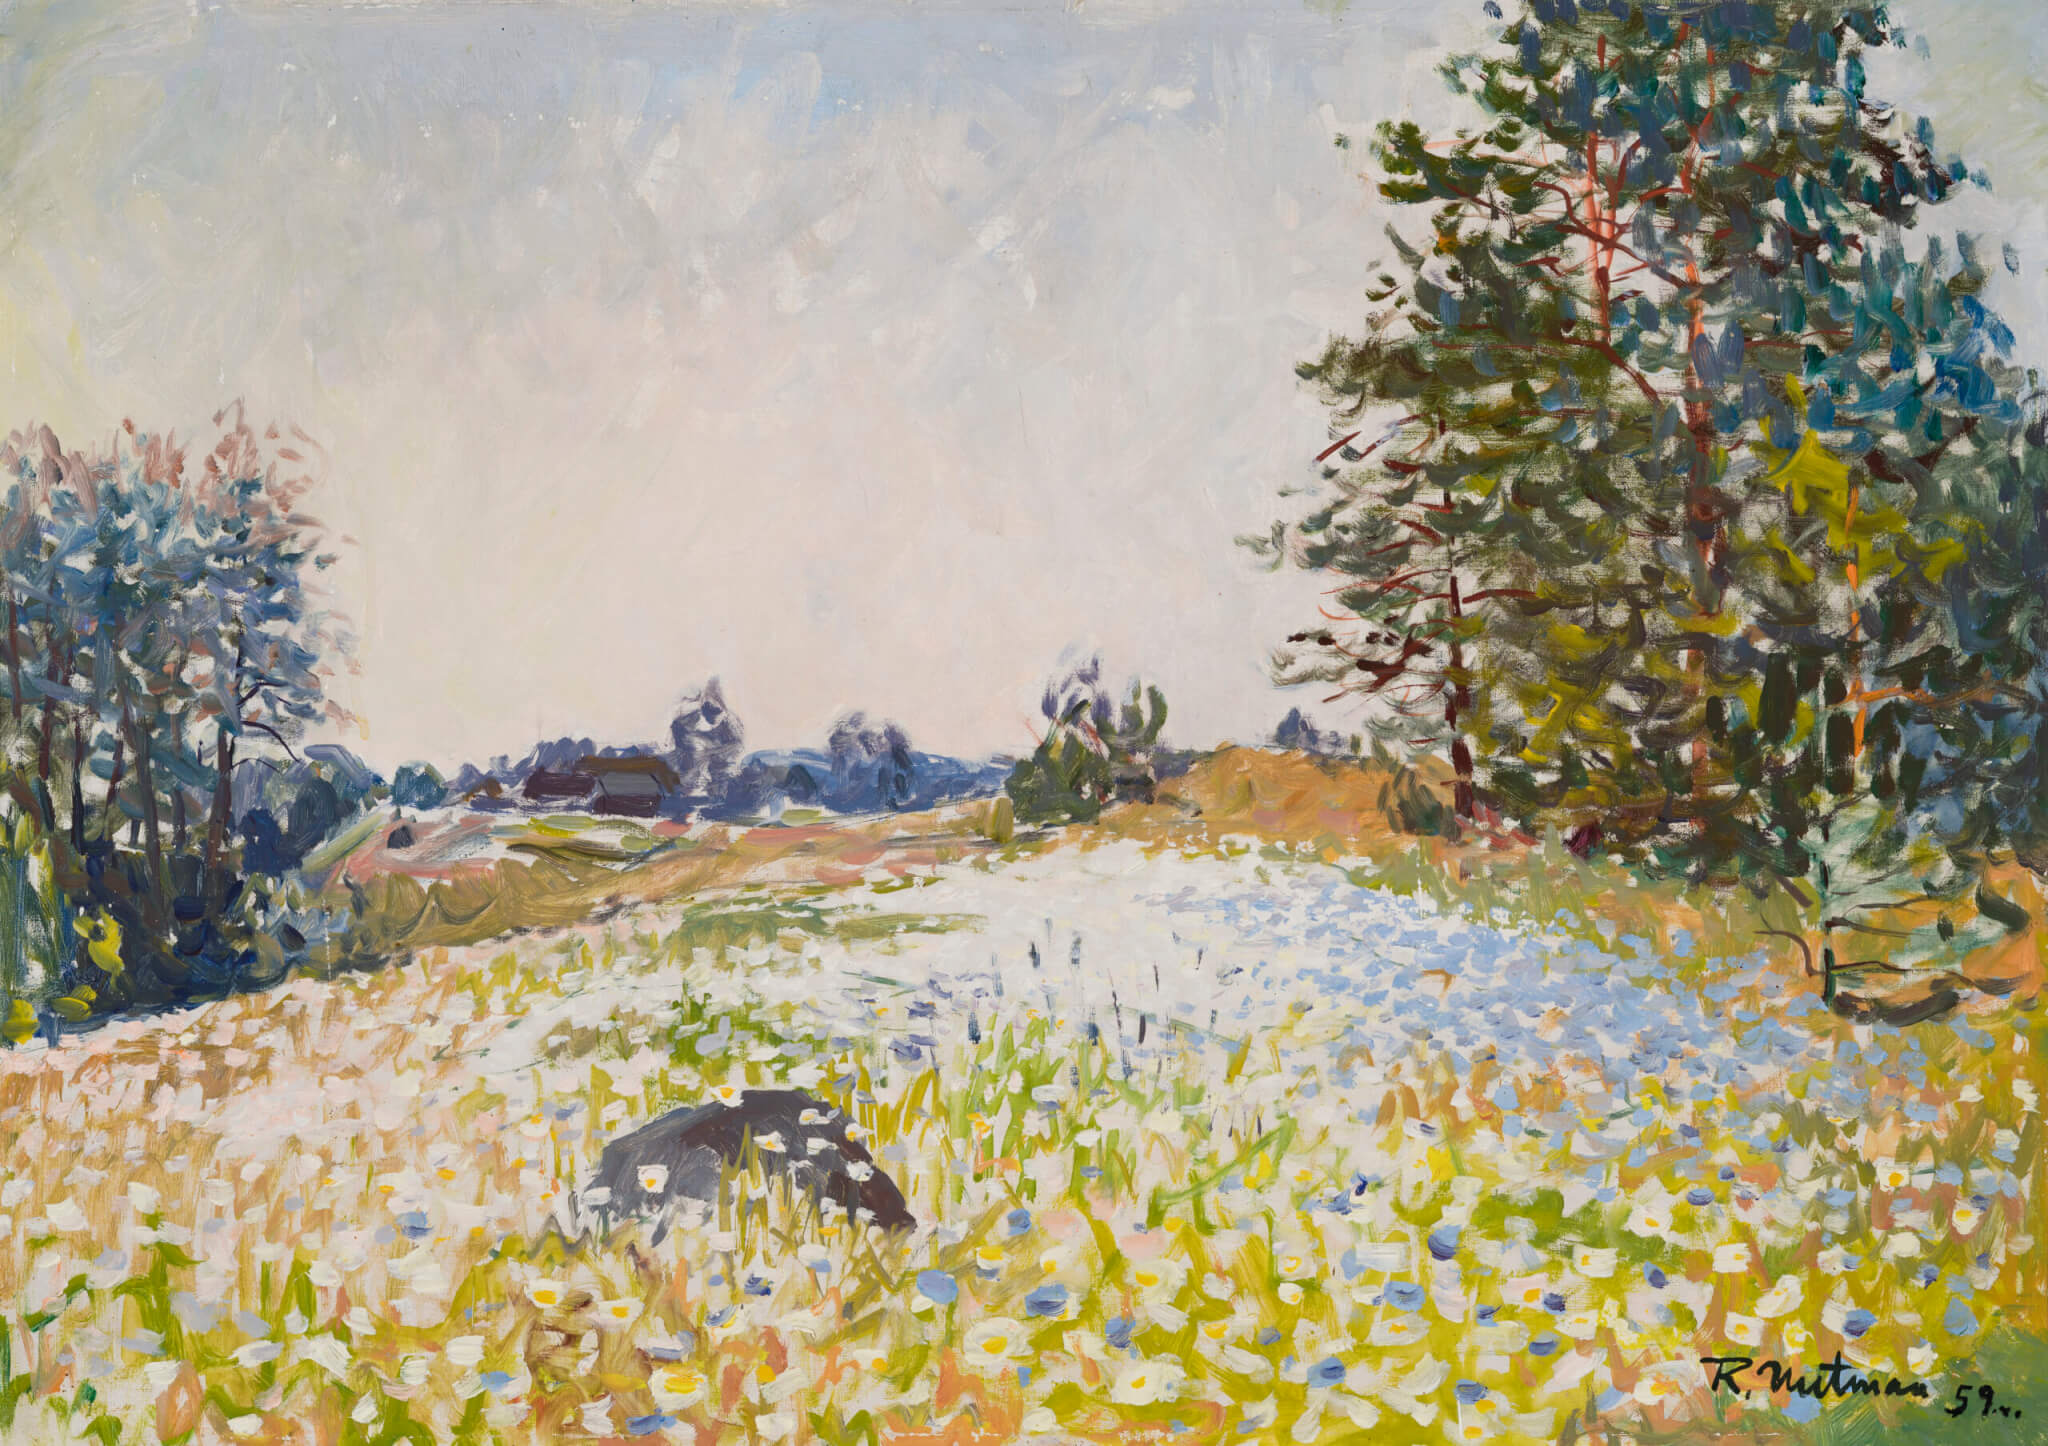 Richard-Uutmaa-kunstinäitus-Allee-galerii-Kurtna-järv